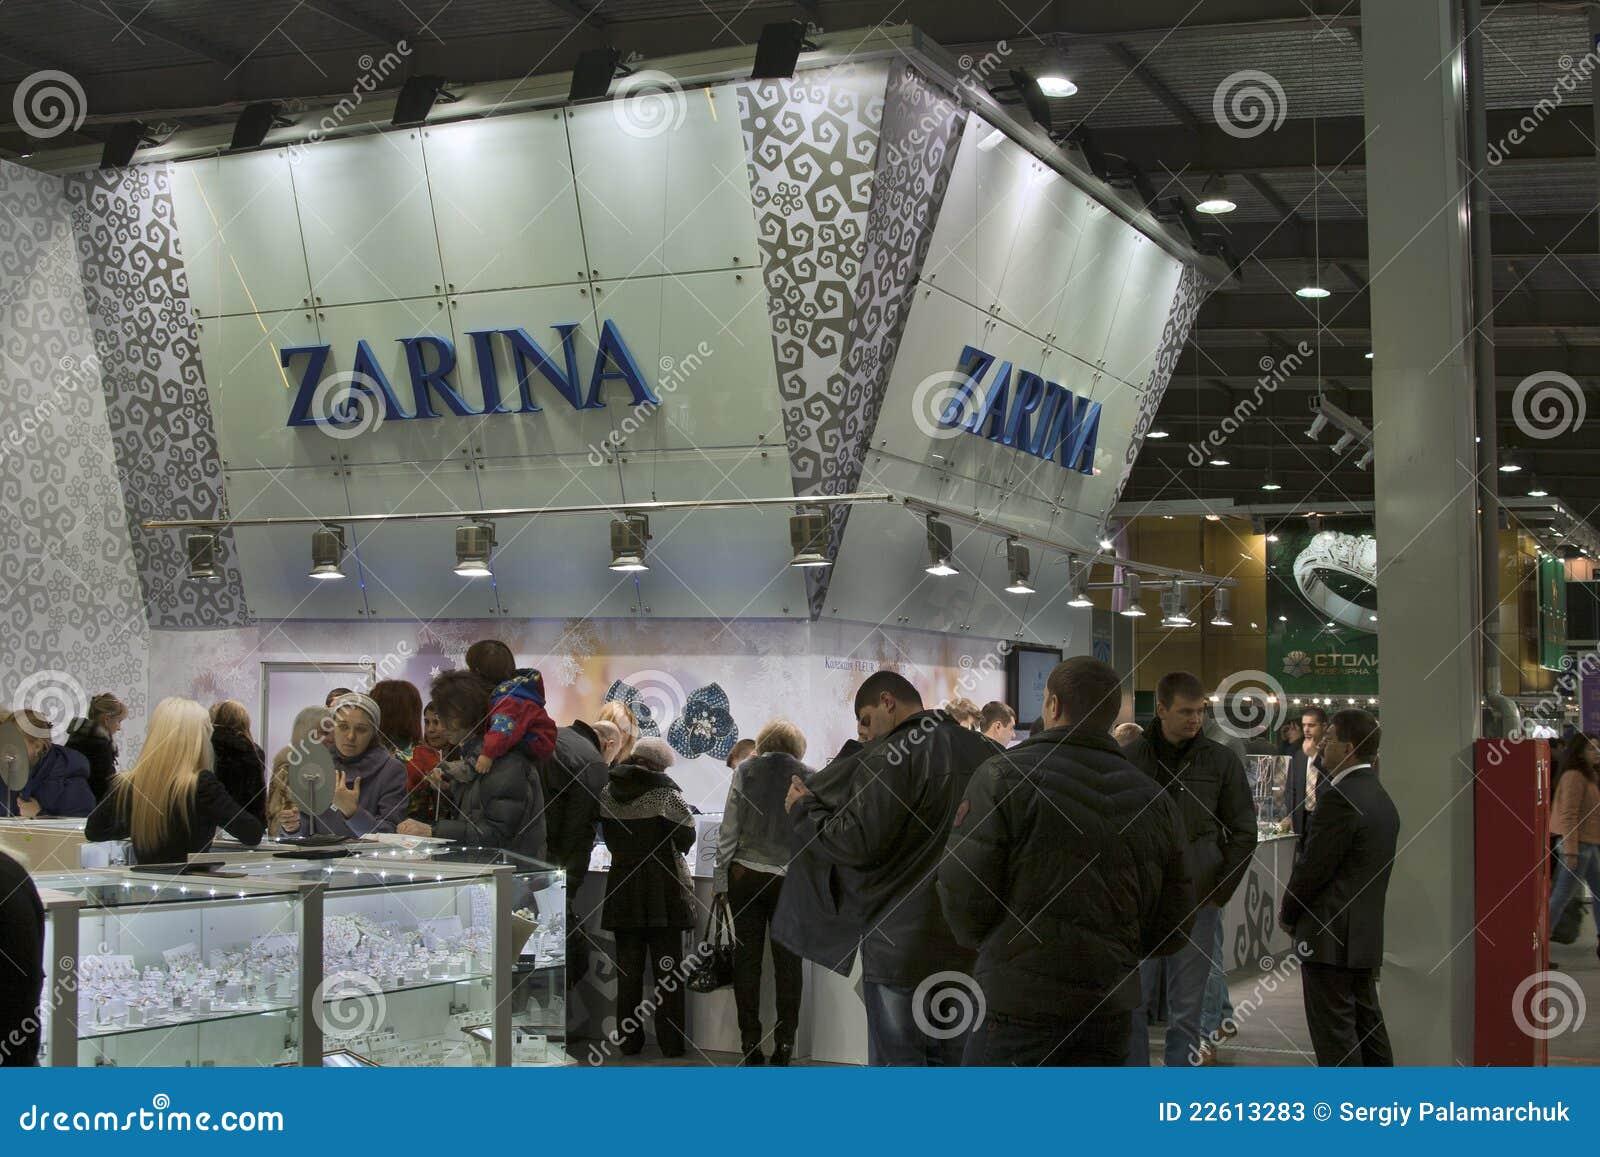 Zarina model house